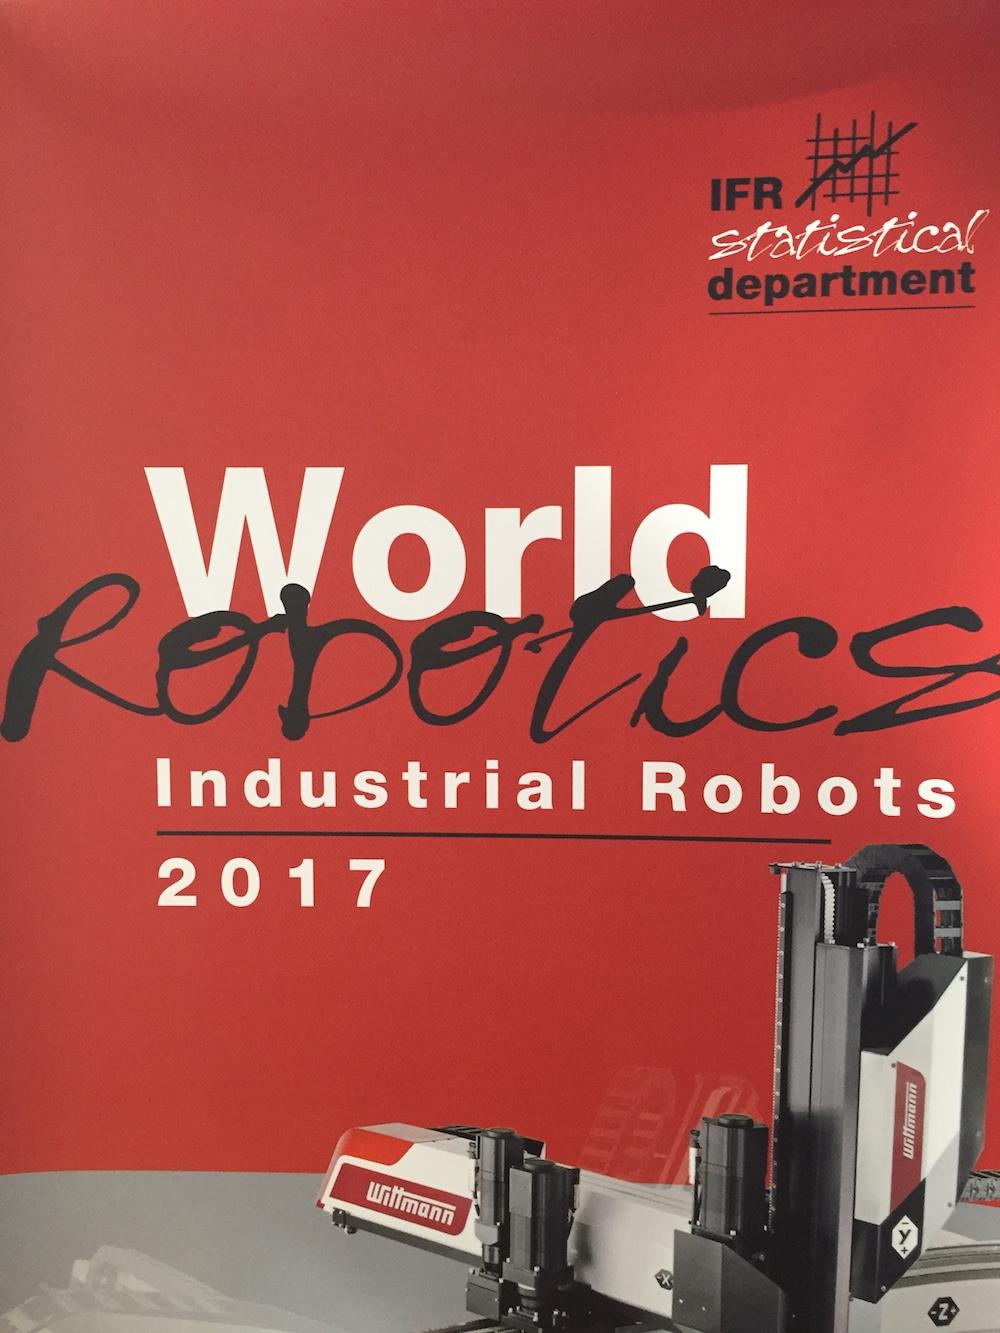 (Quelle: The International Federation of Robotics)